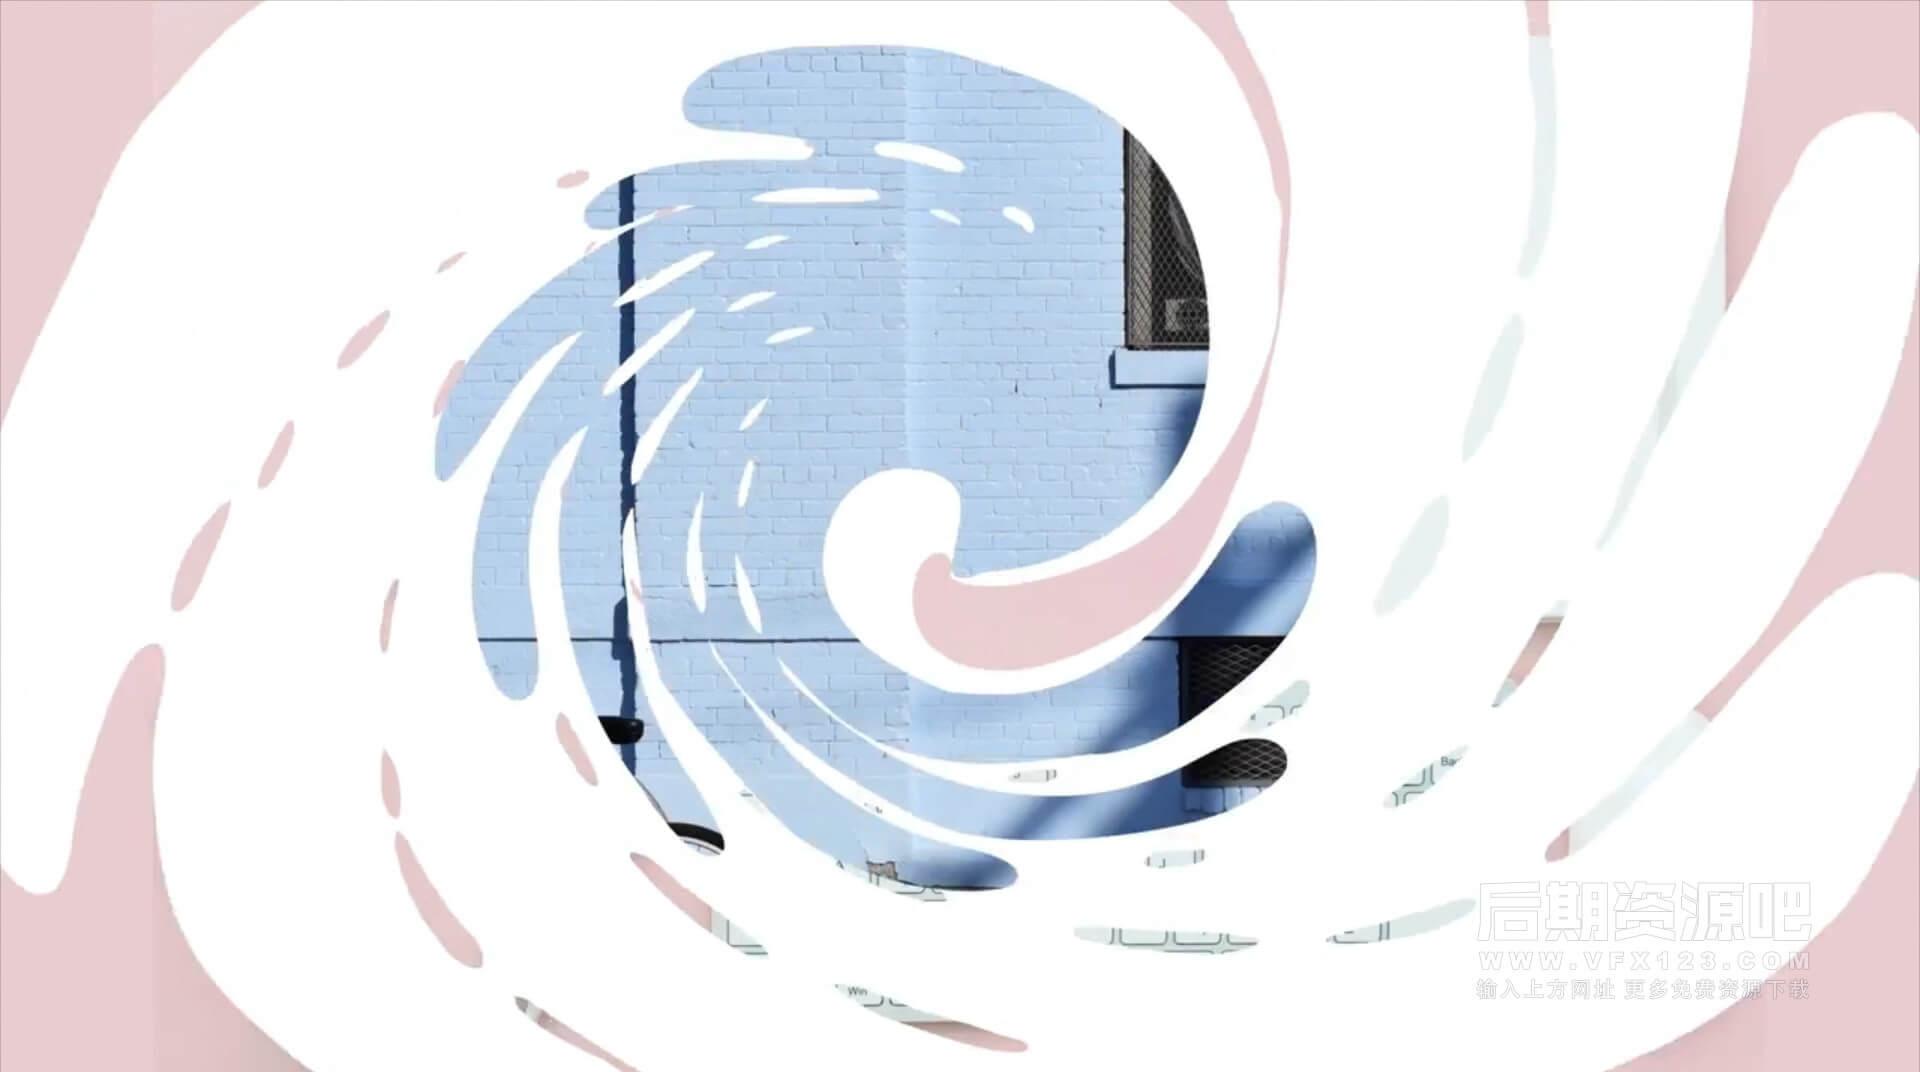 Fcpx插件 10组卡通液体水流可爱标题模板 Vlog常用标题